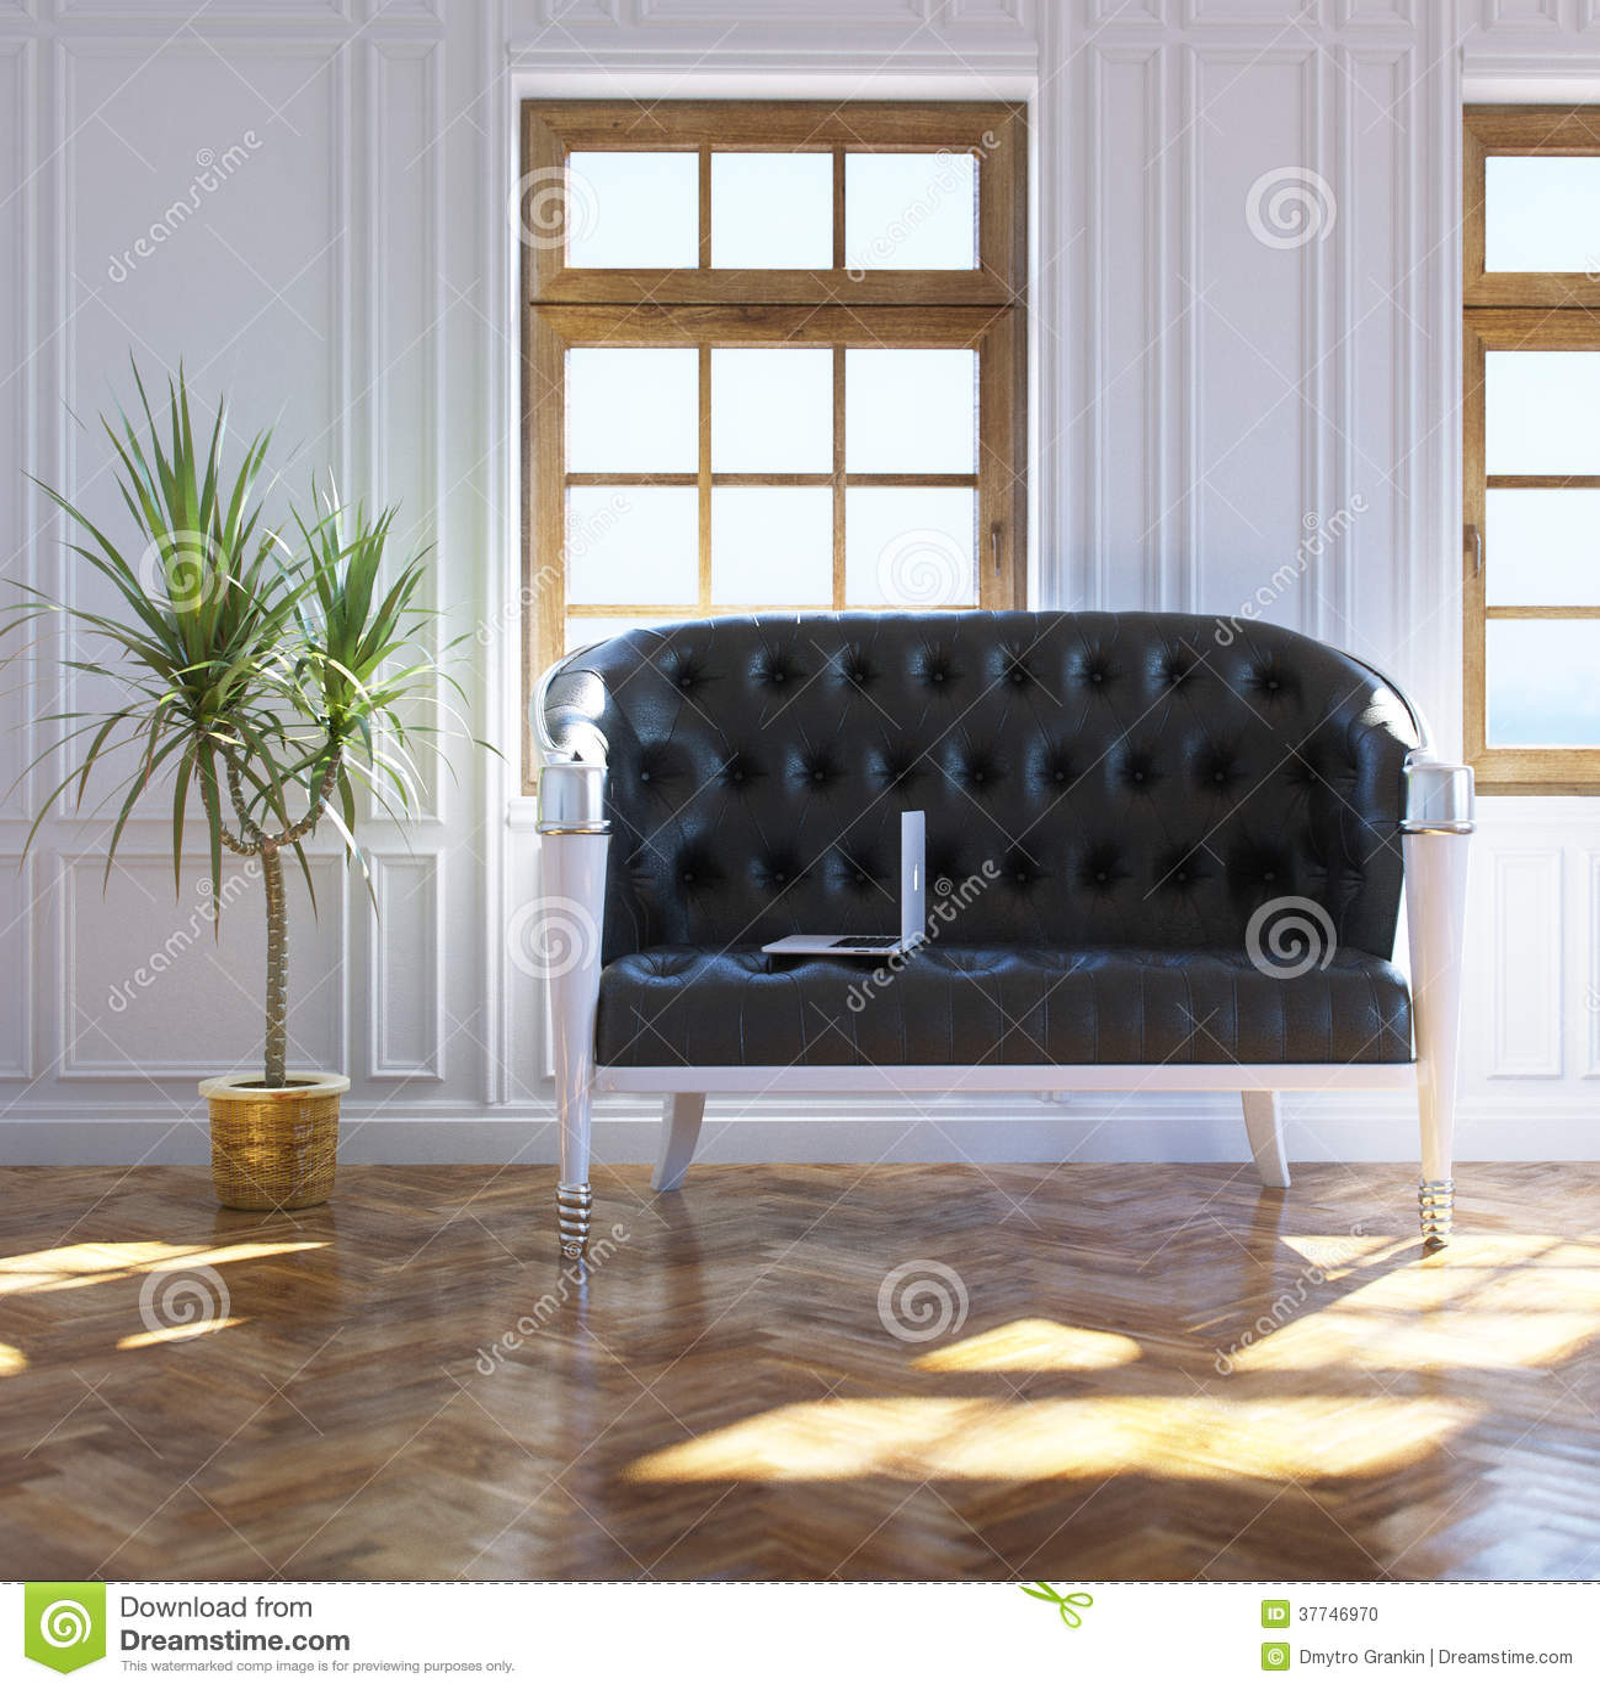 vintage window interior design royalty free stock photo. Black Bedroom Furniture Sets. Home Design Ideas